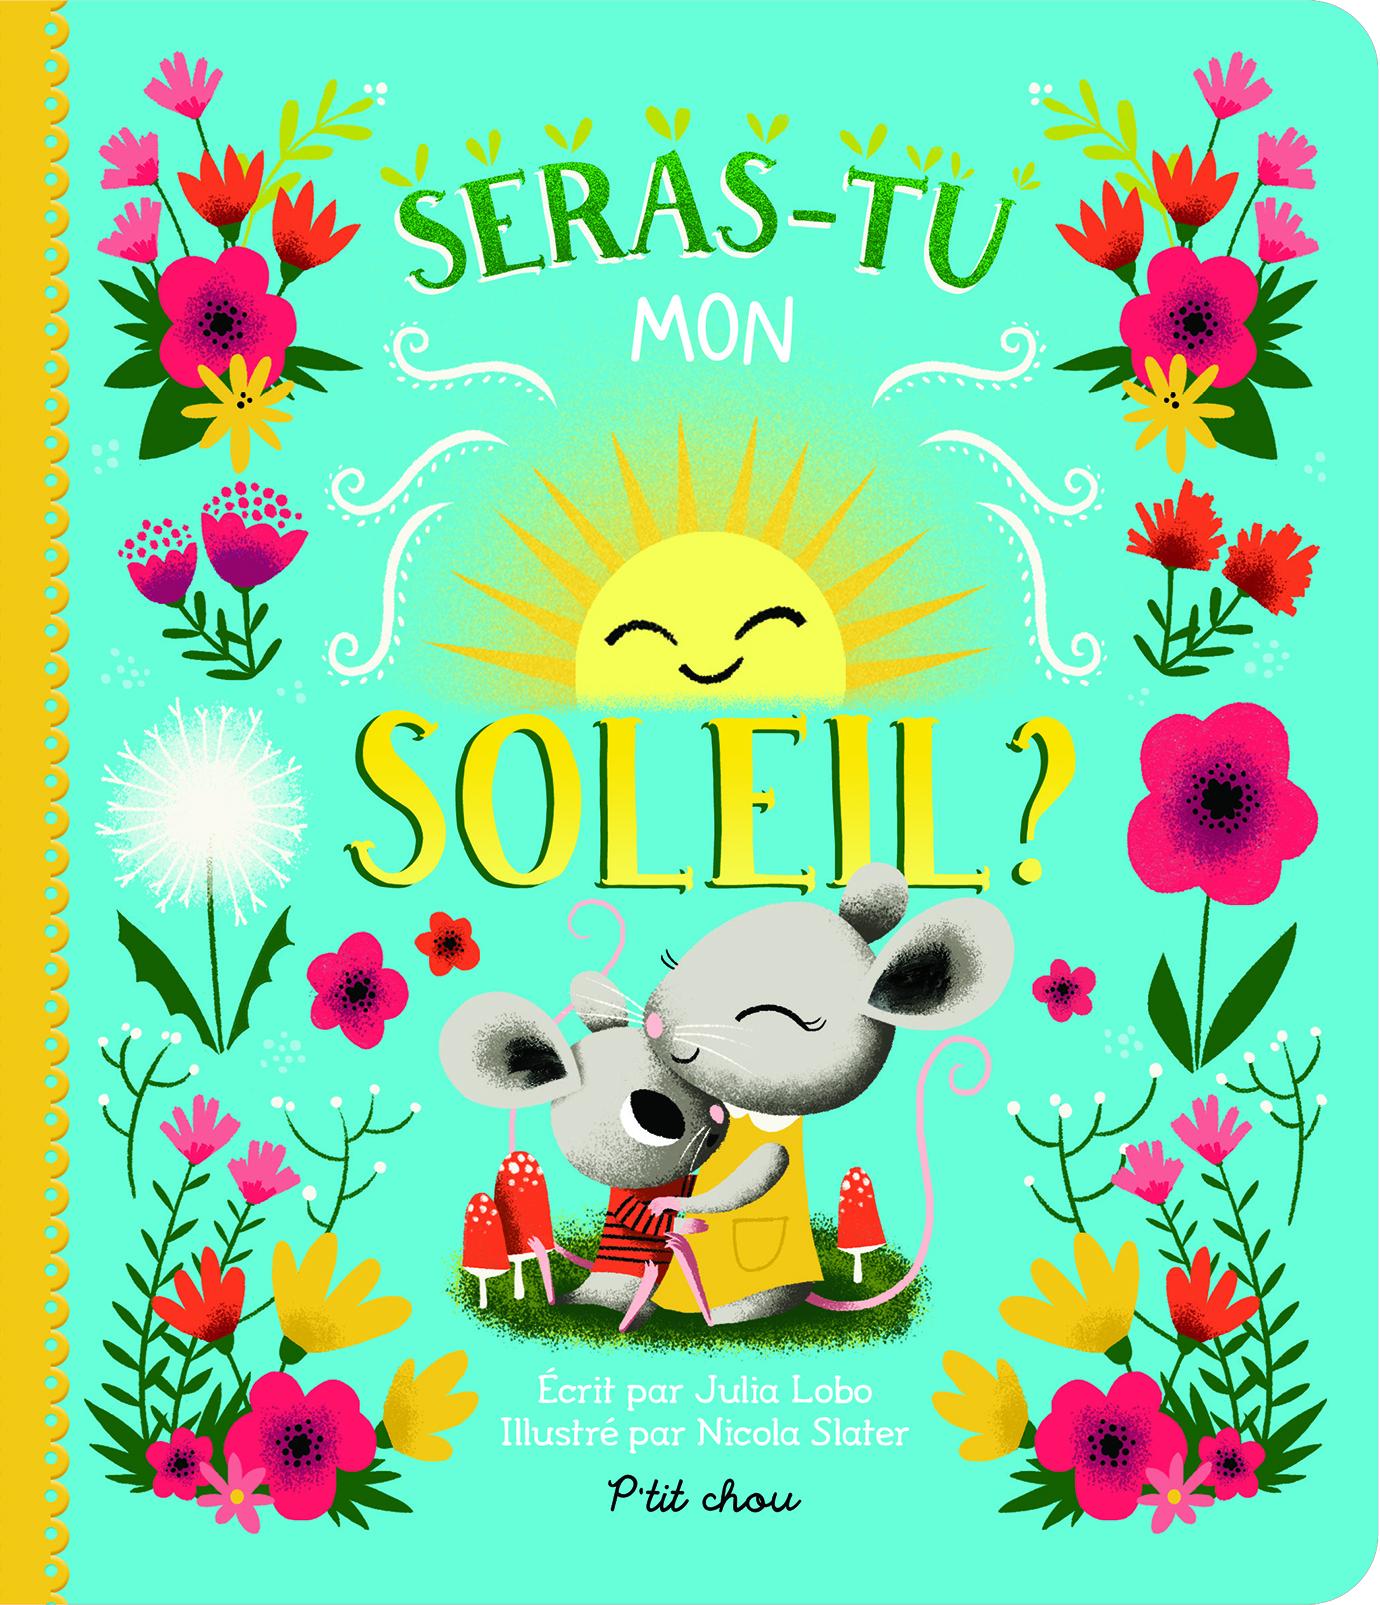 SERAS-TU MON SOLEIL ?